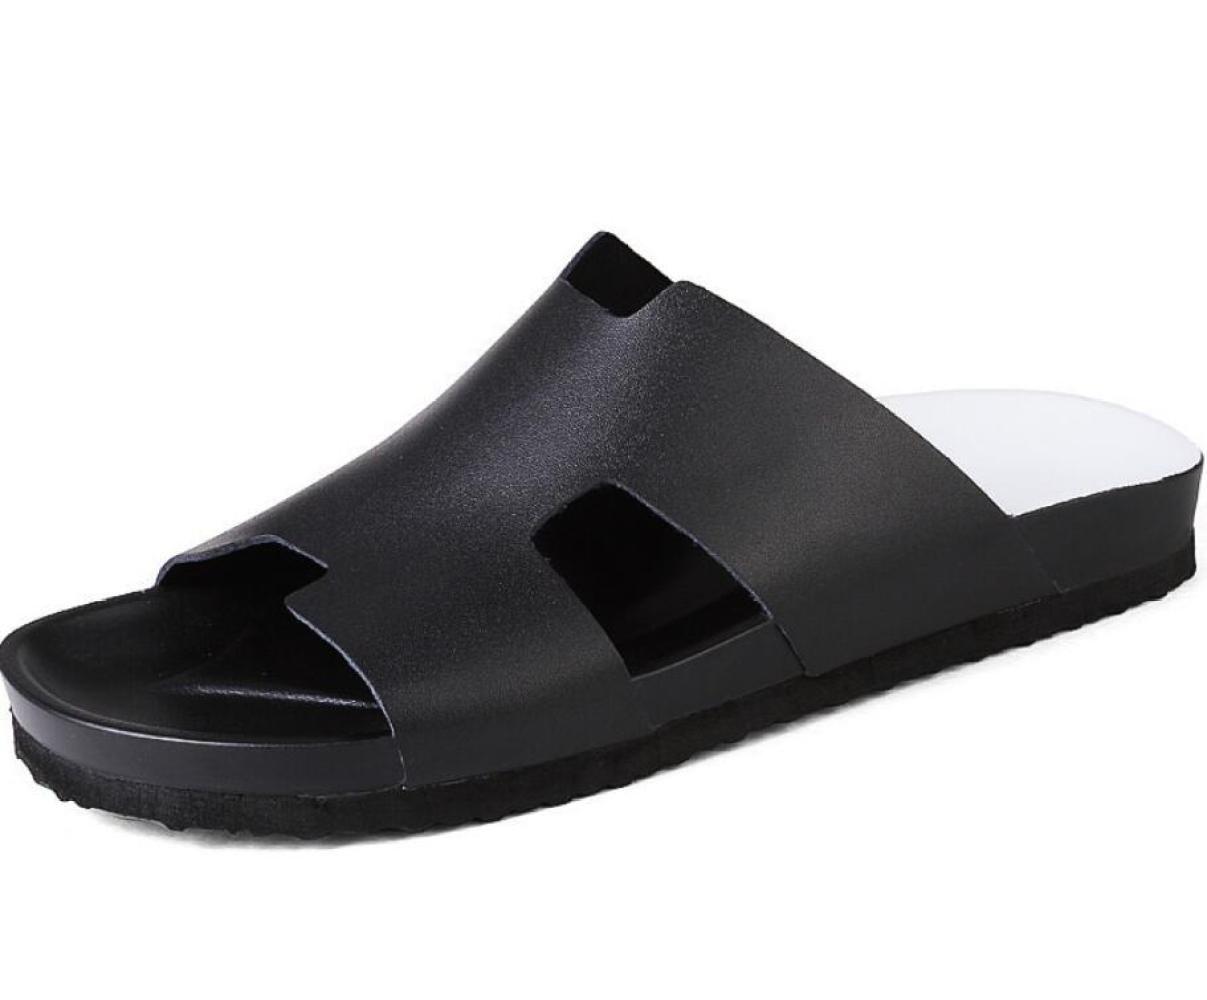 DHFUD Zapatos De Hombre Palabra Zapatillas Sandalias De Verano Sandalias Sandalias Zapatos De Playa 39 EU|Black